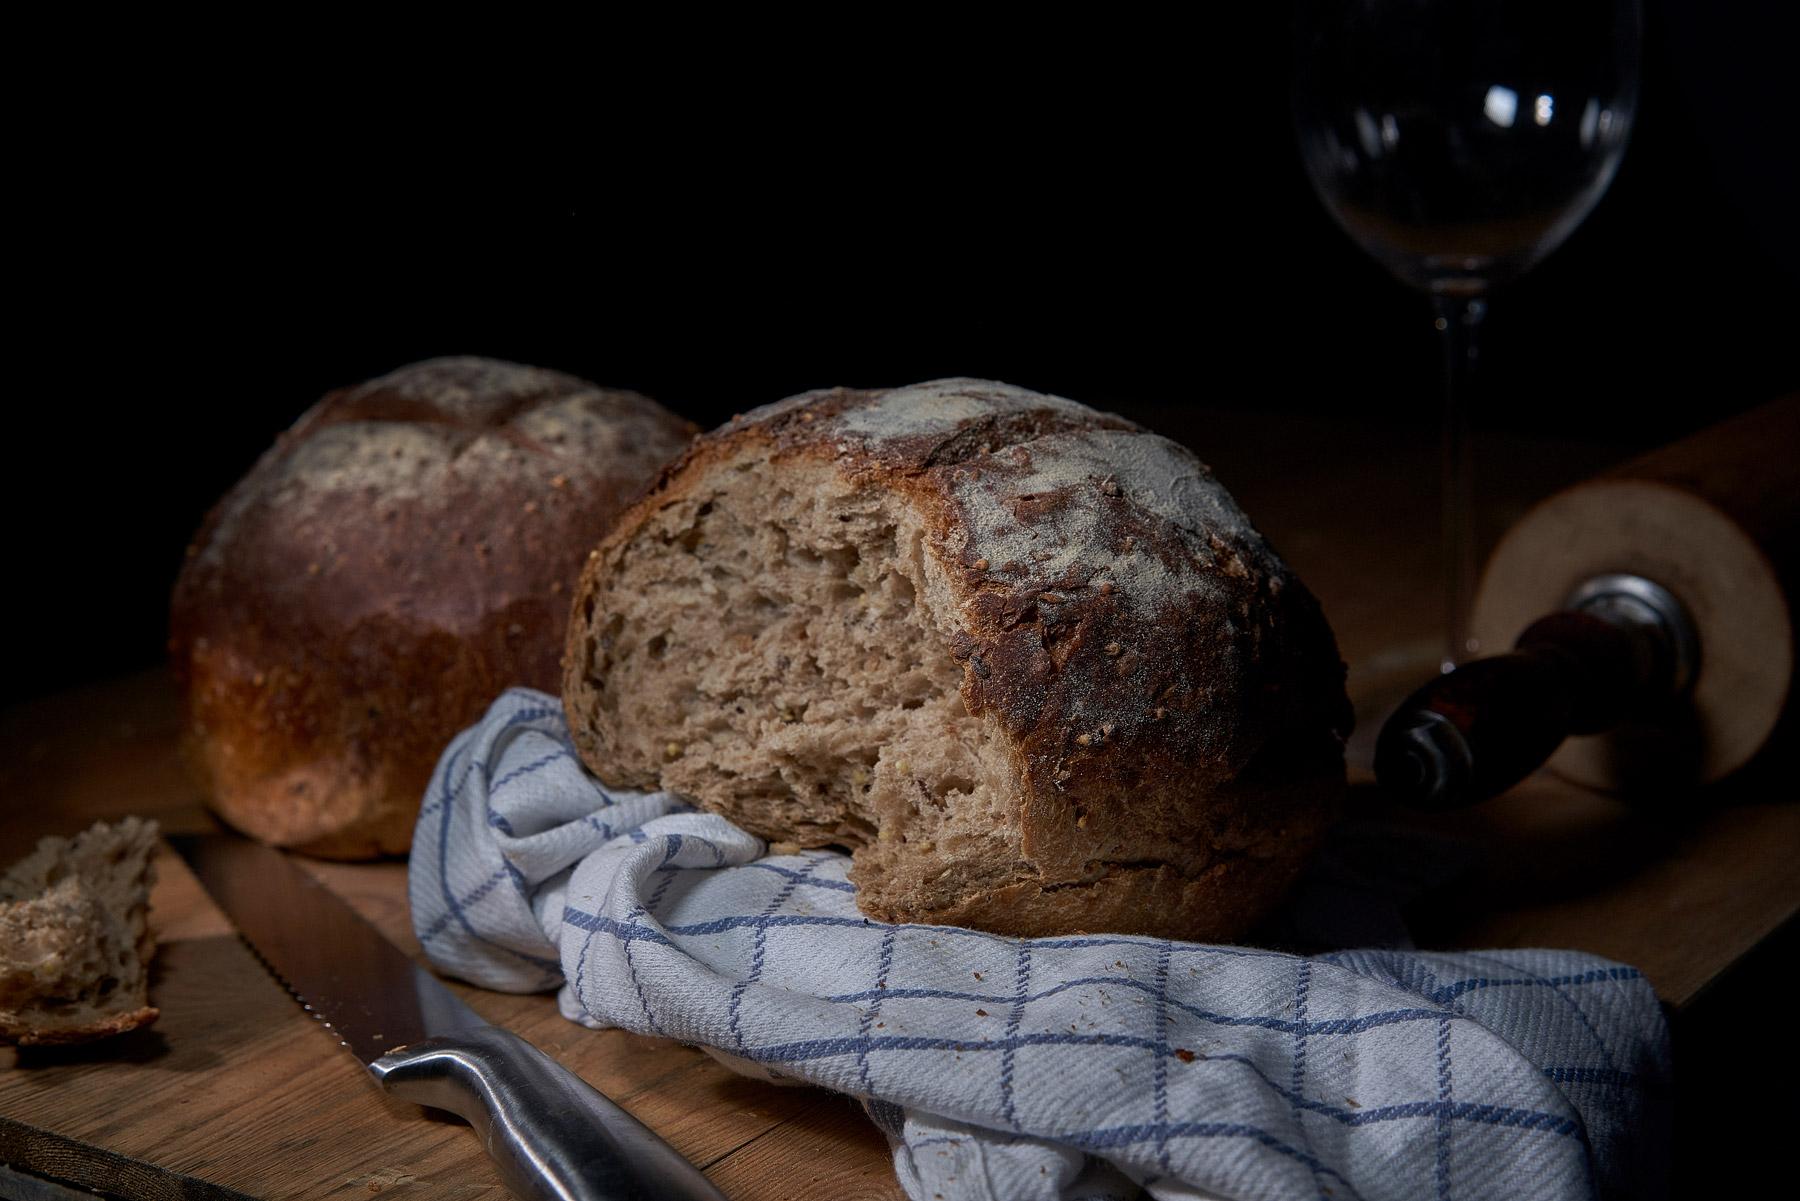 boulangerie-pain-levain-epautre-levure-chocolat-photographe-tournai-leuze-hainaut-belgique